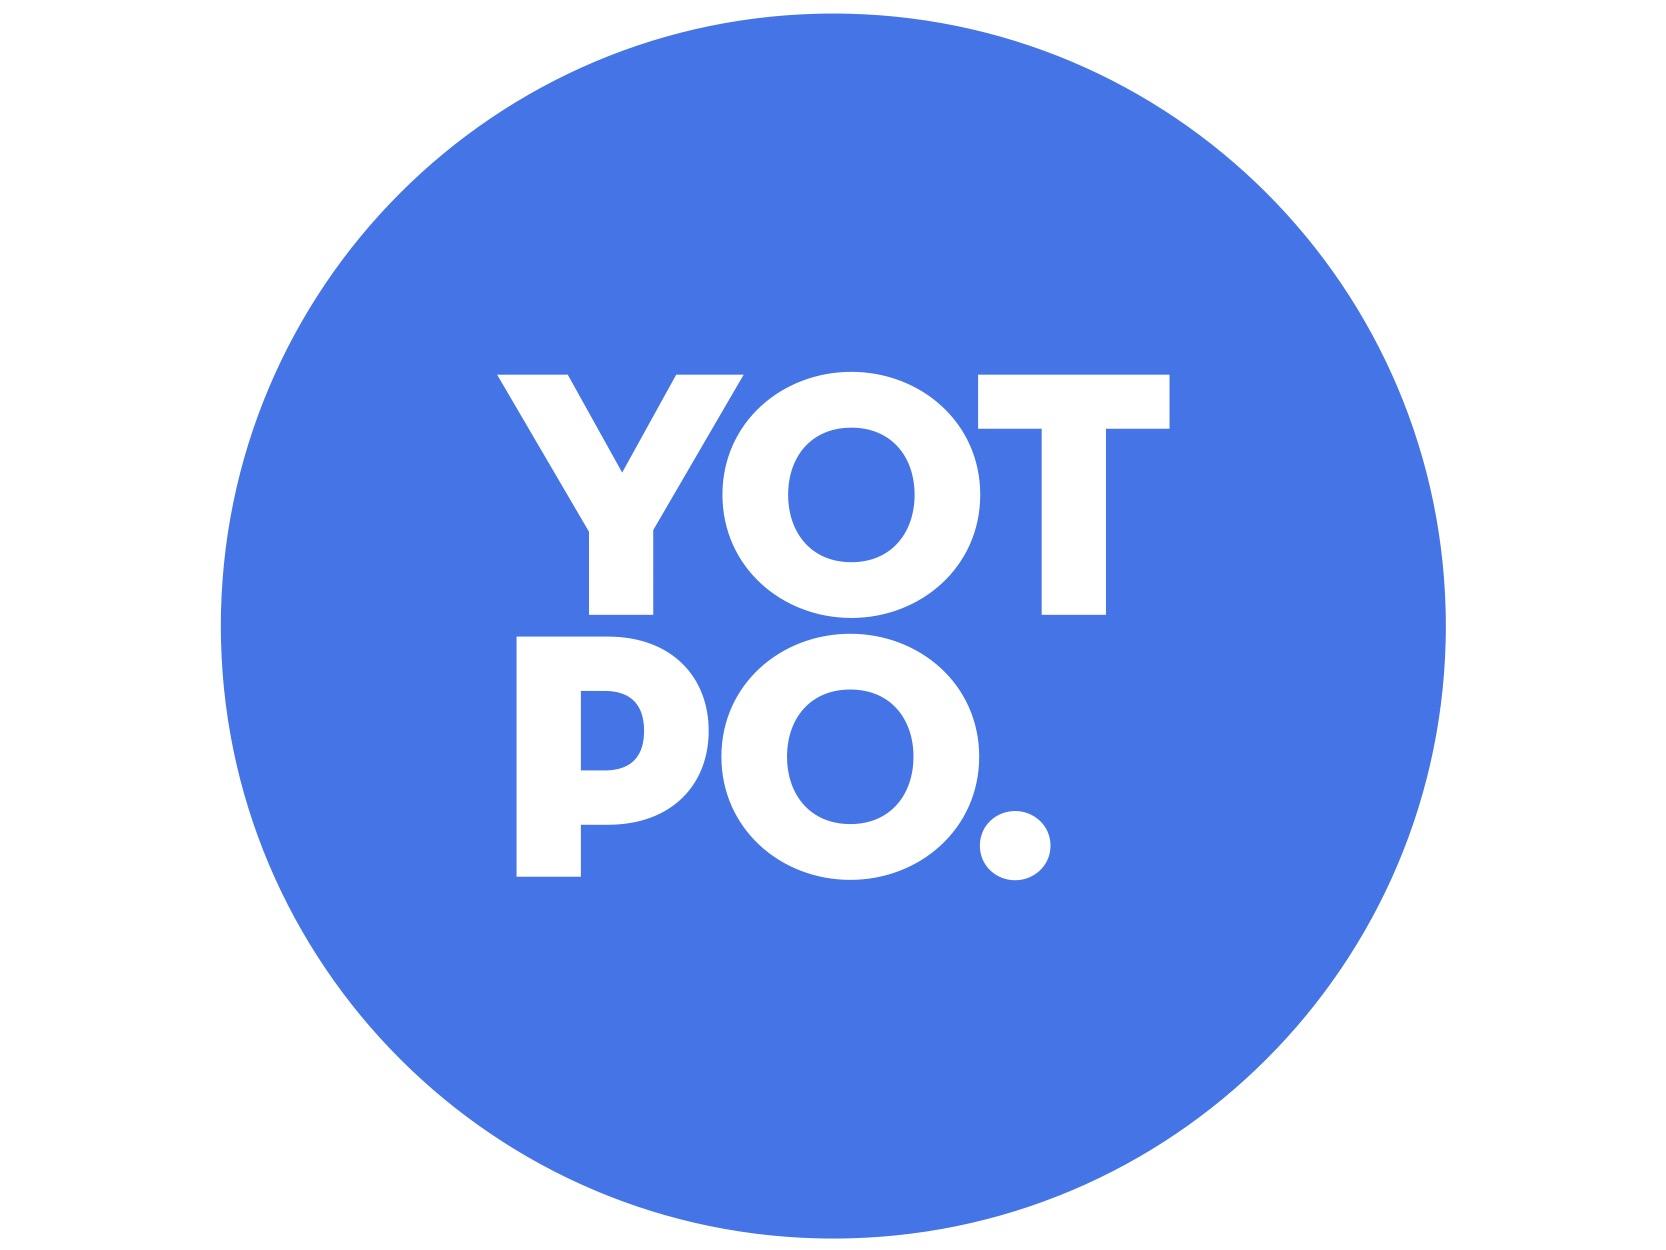 Yotpo logo HighR.jpg